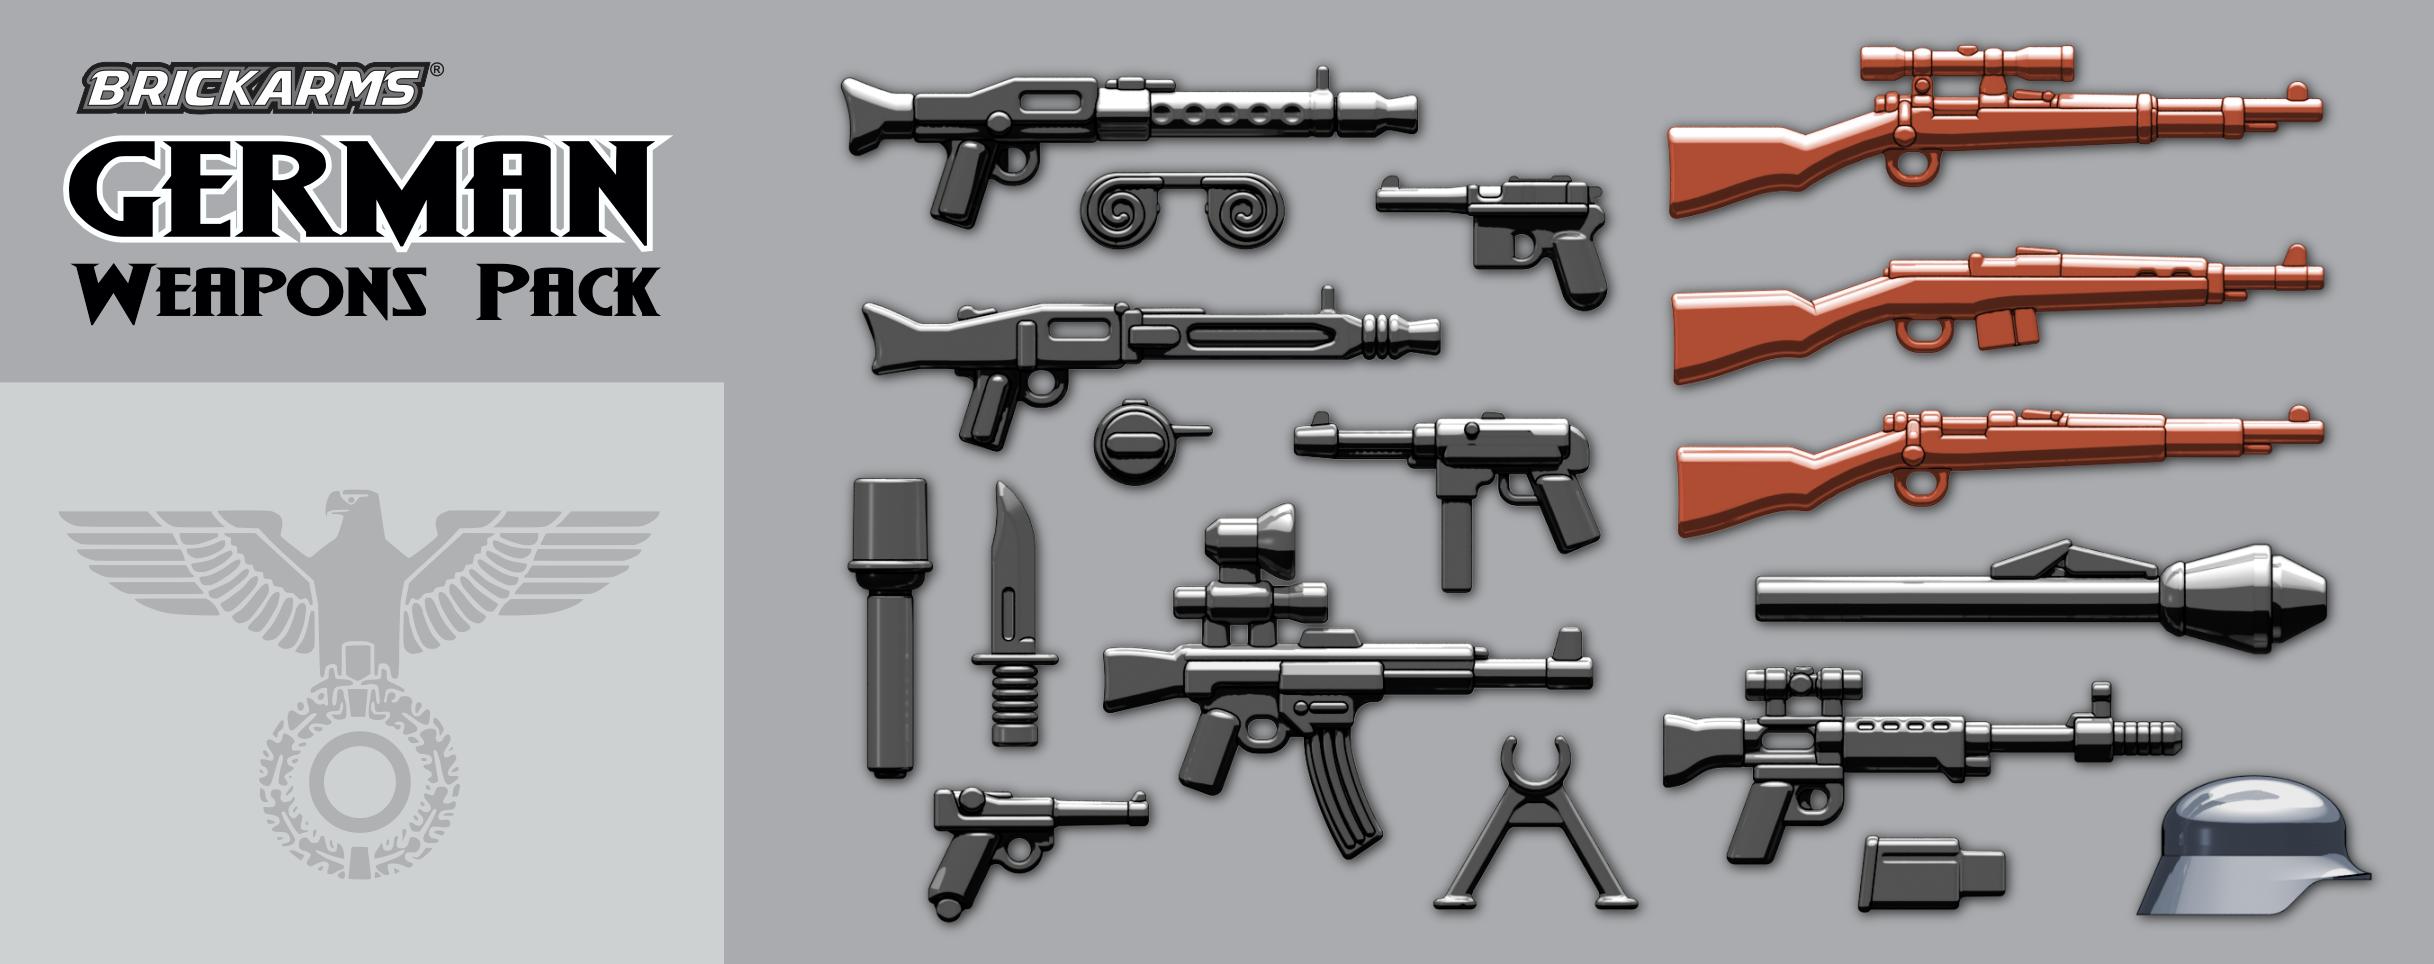 german-weapons-pack-2015-long.png